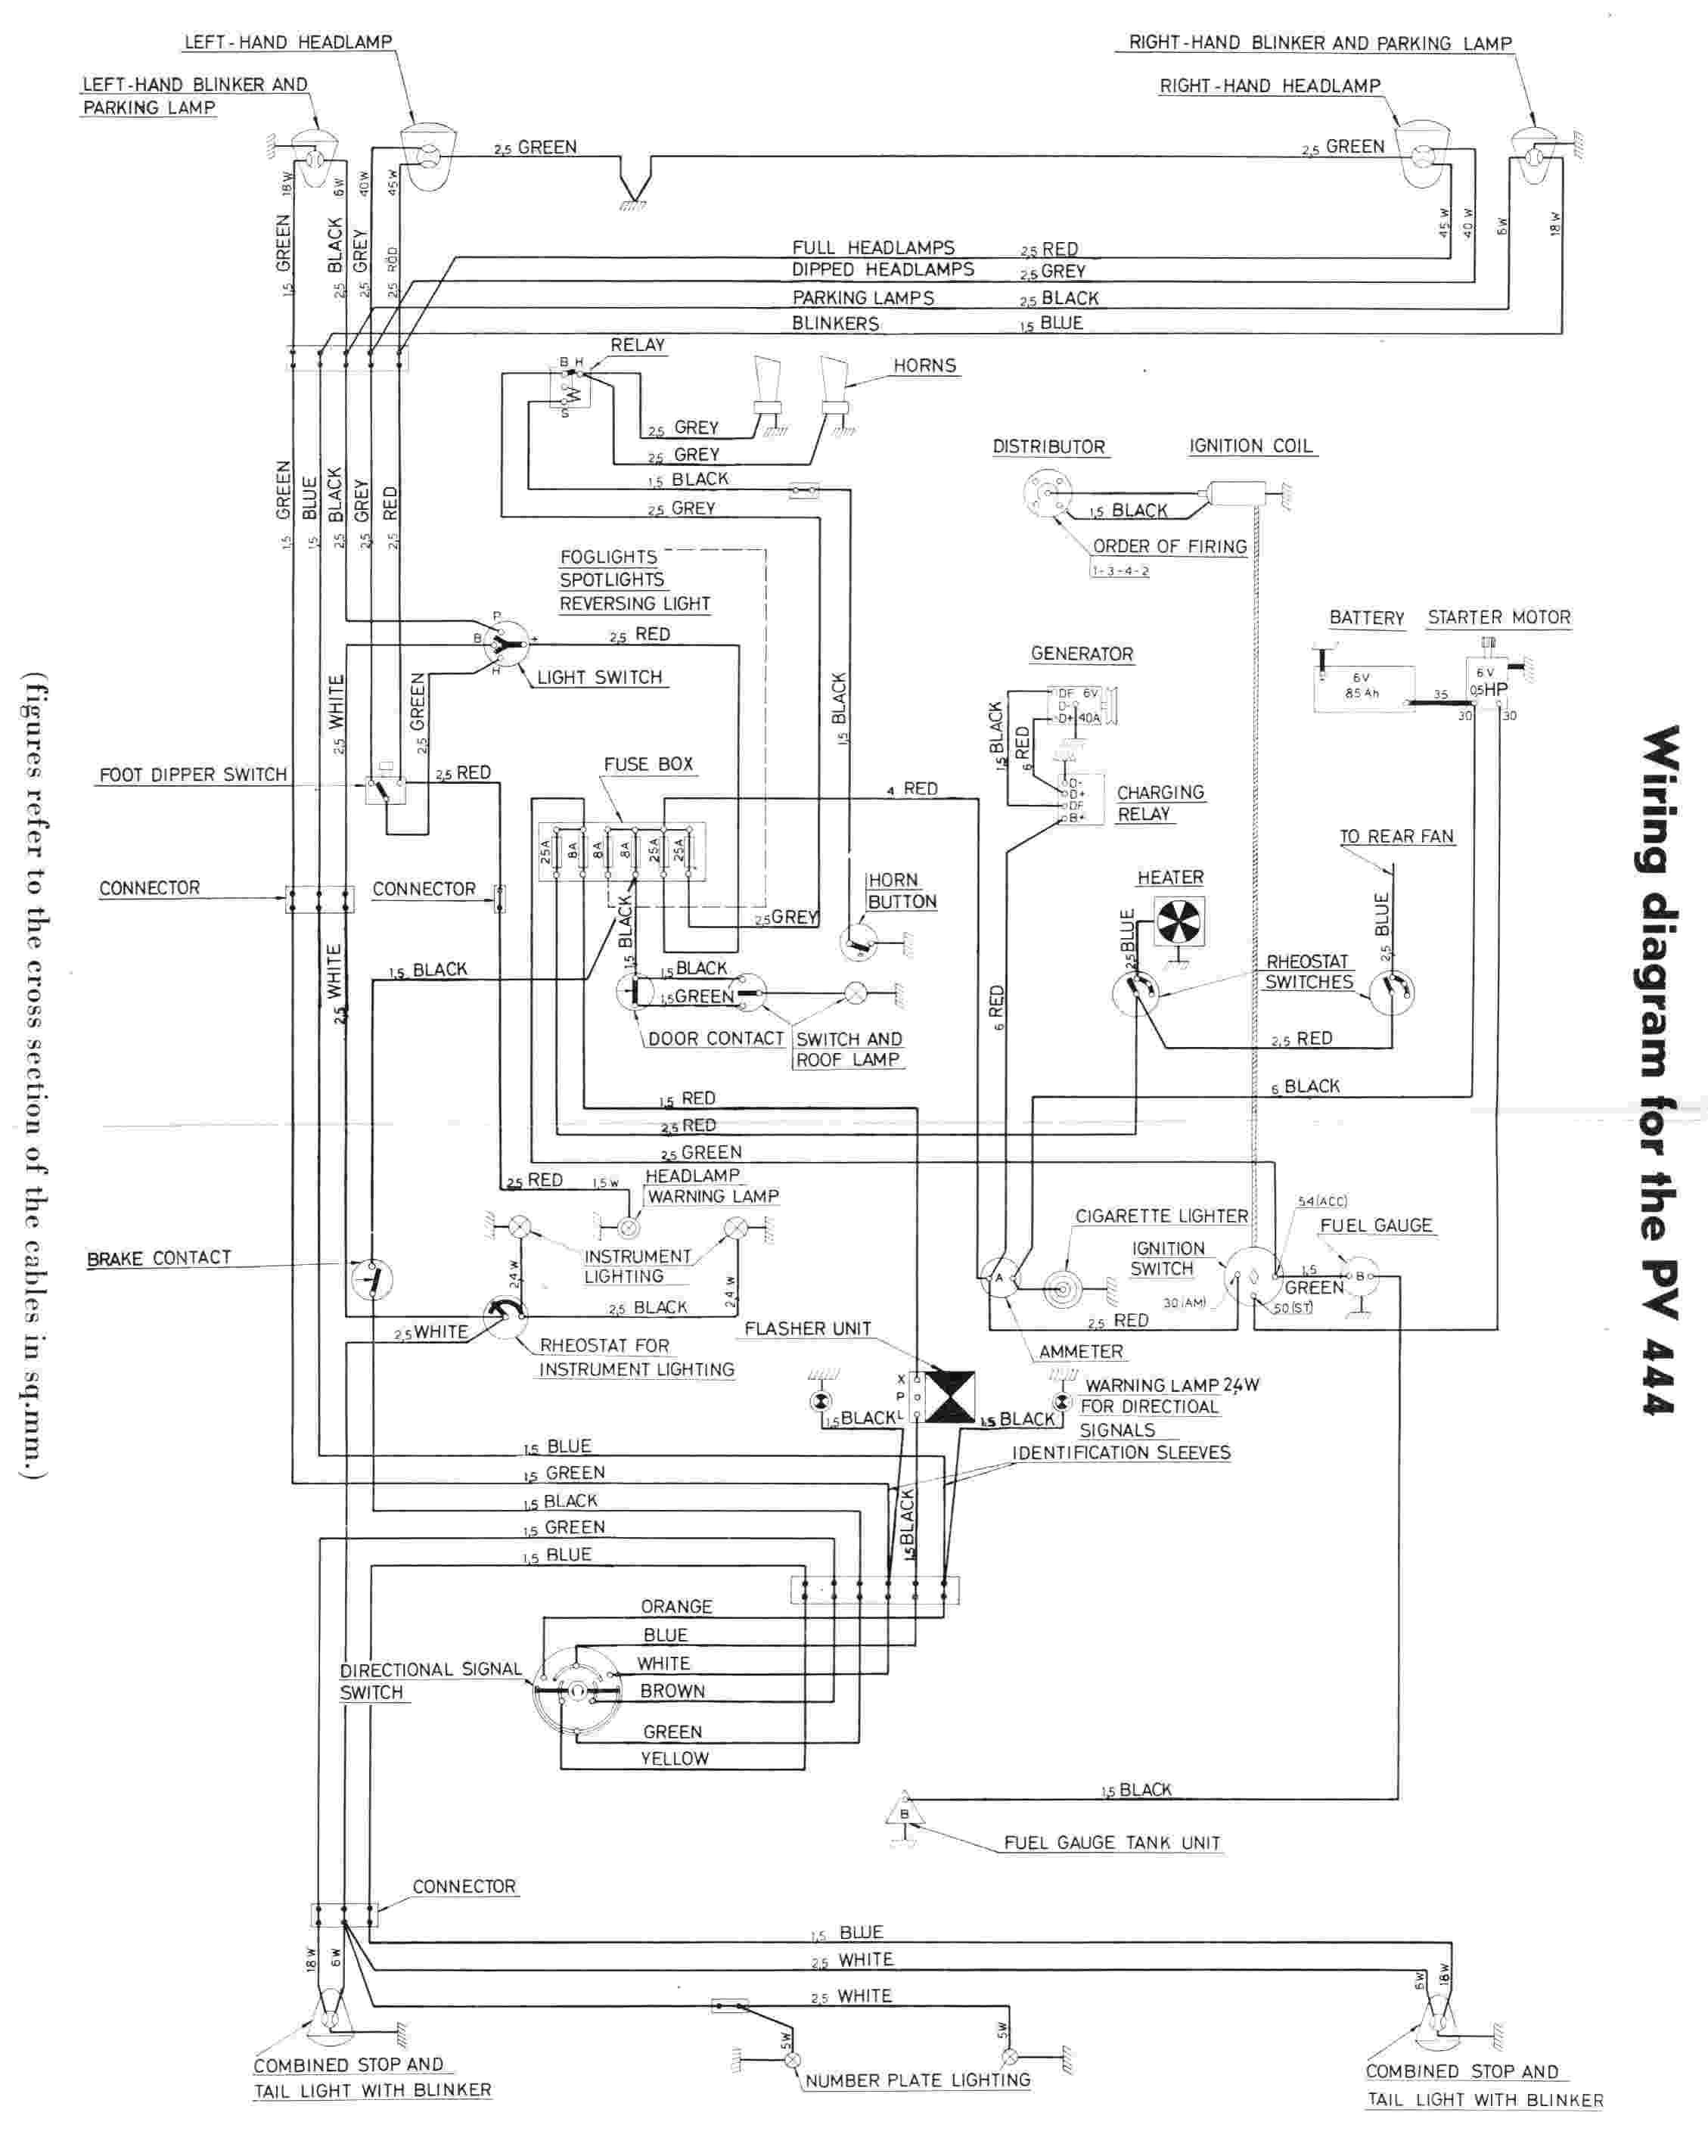 volvo truck electrical diagram trusted wiring diagram online volvo transmission schematic 1993 volvo wiring schematic battery [ 2258 x 2850 Pixel ]